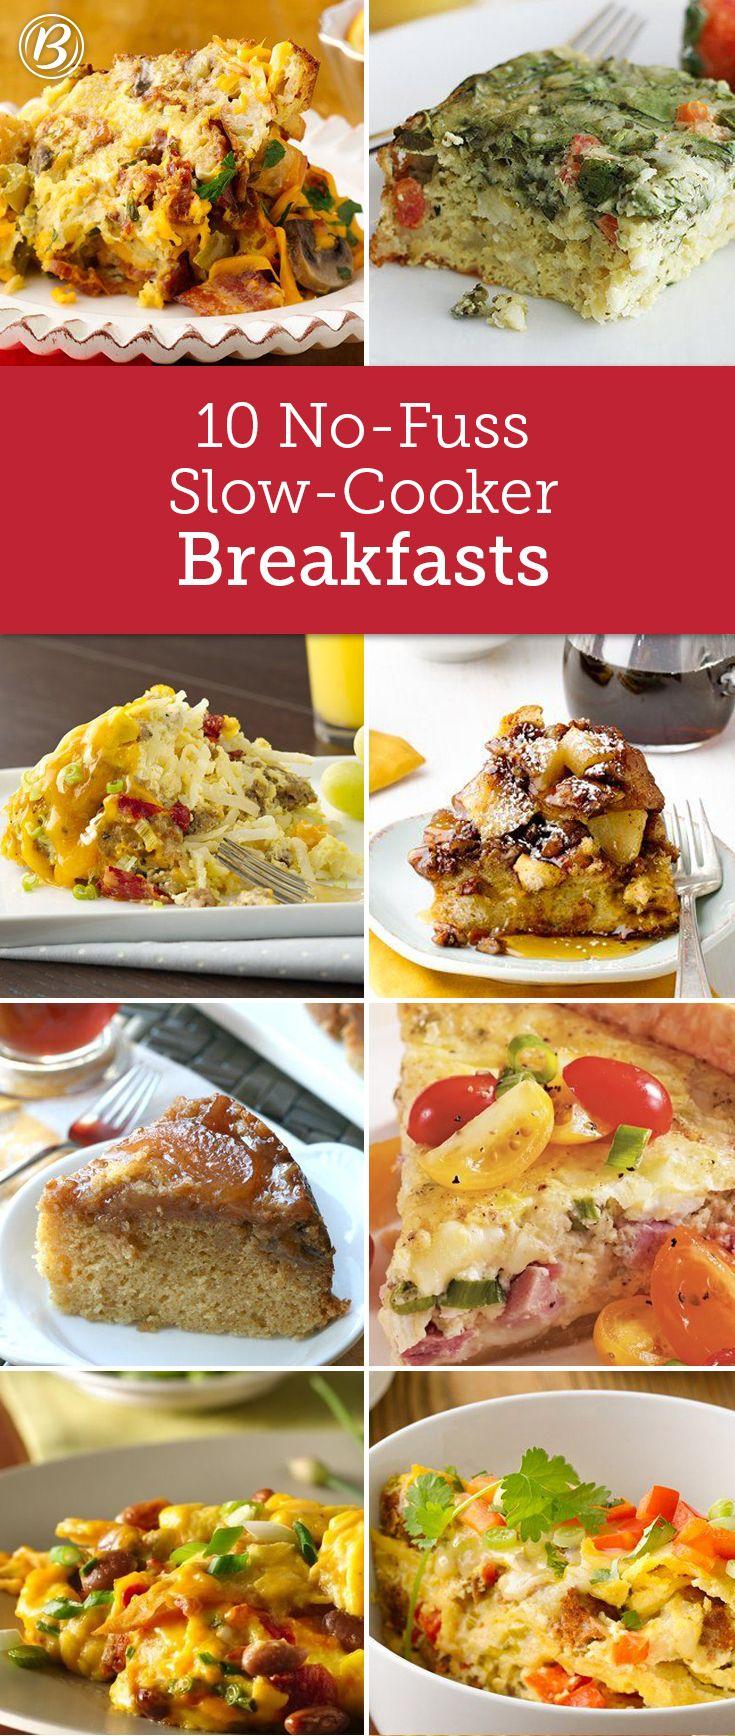 7 Tasty Slow Cooker Breakfasts